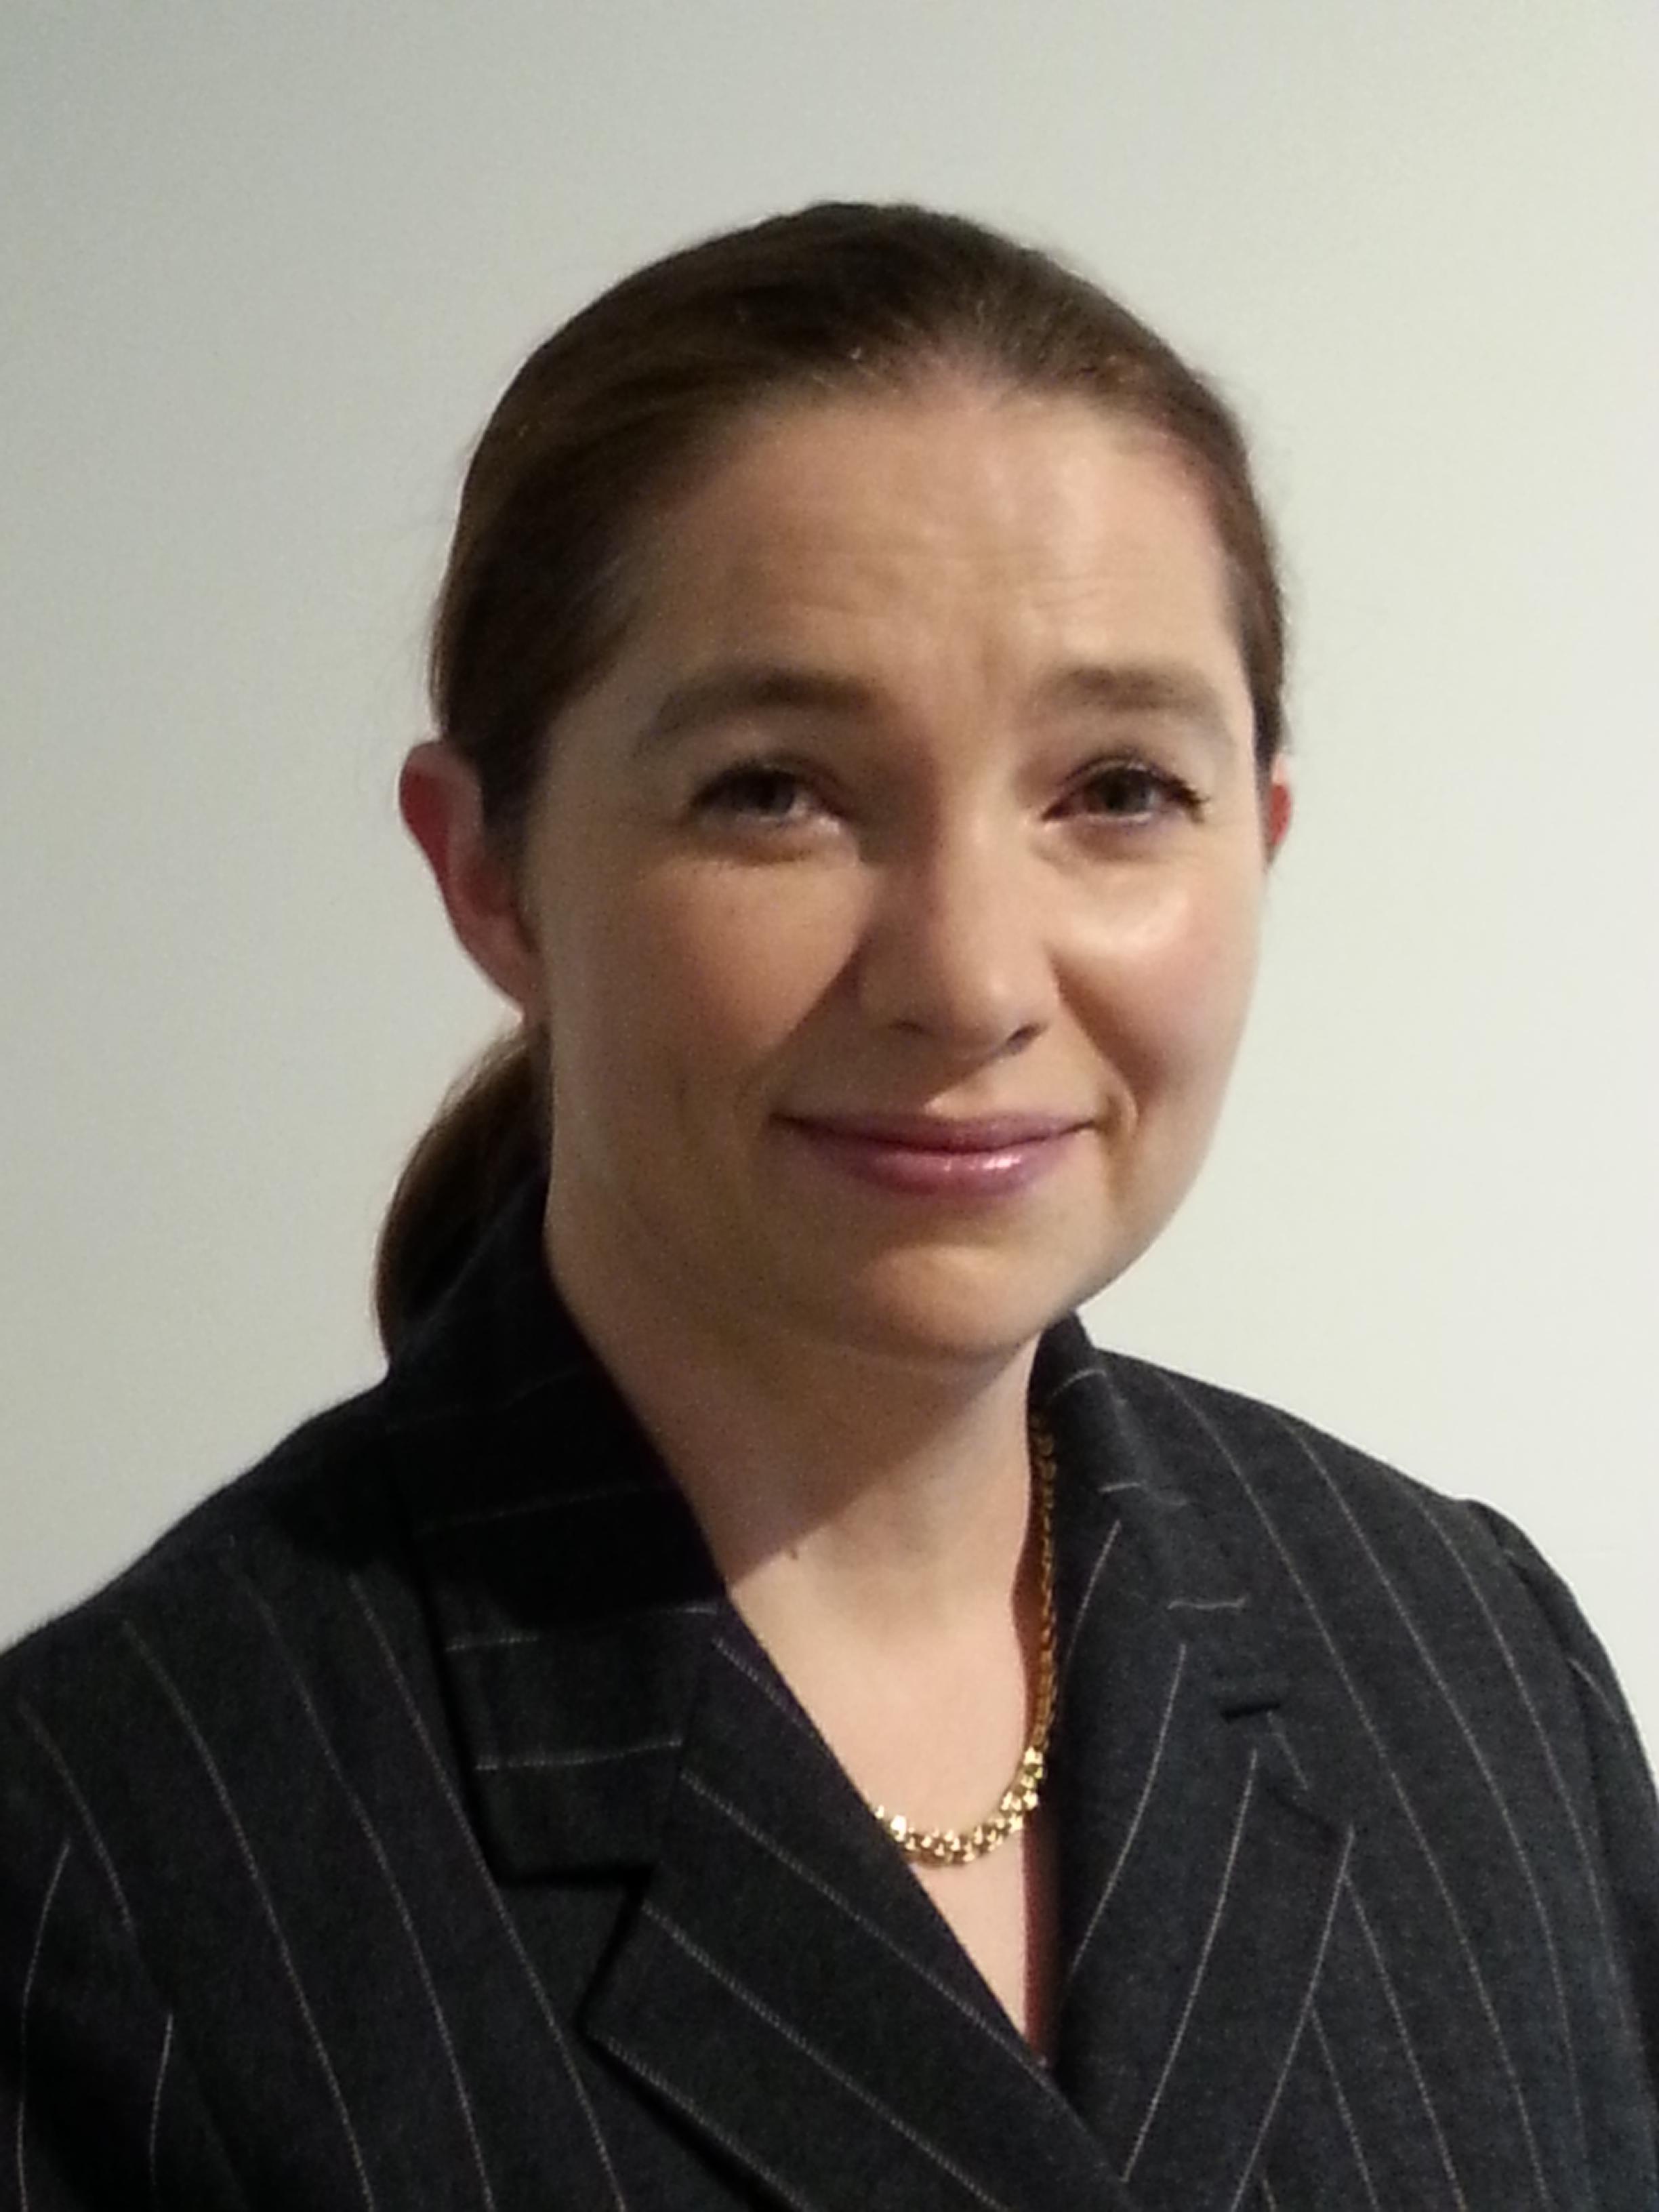 Isabelle Van Cauwenberge